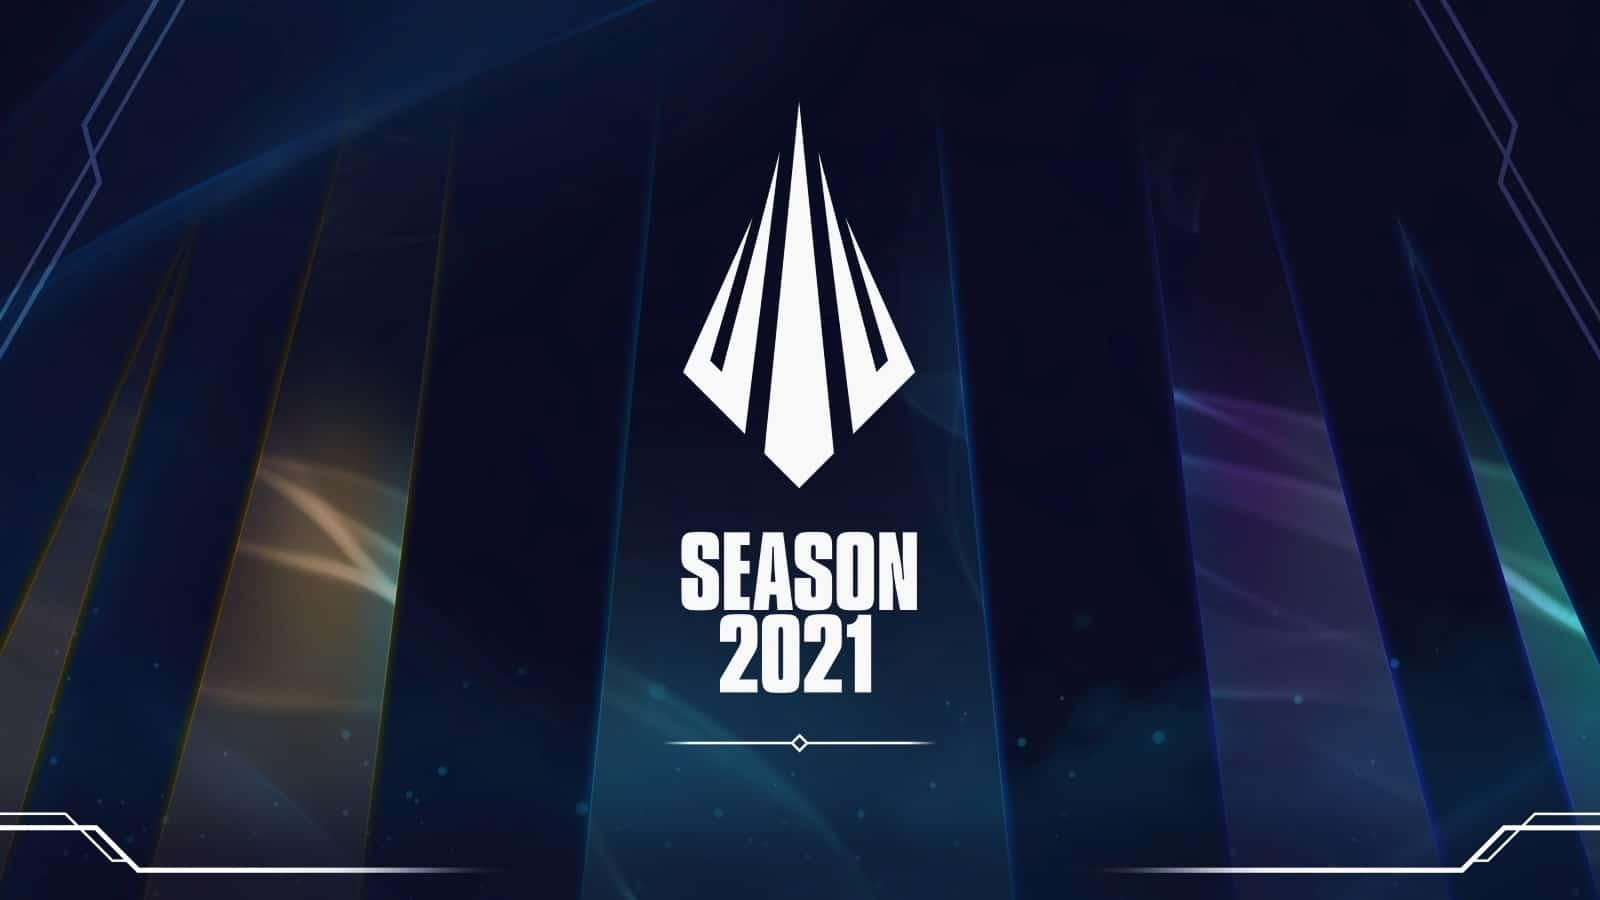 temporada 2021 de LoL Esports, GamersRD